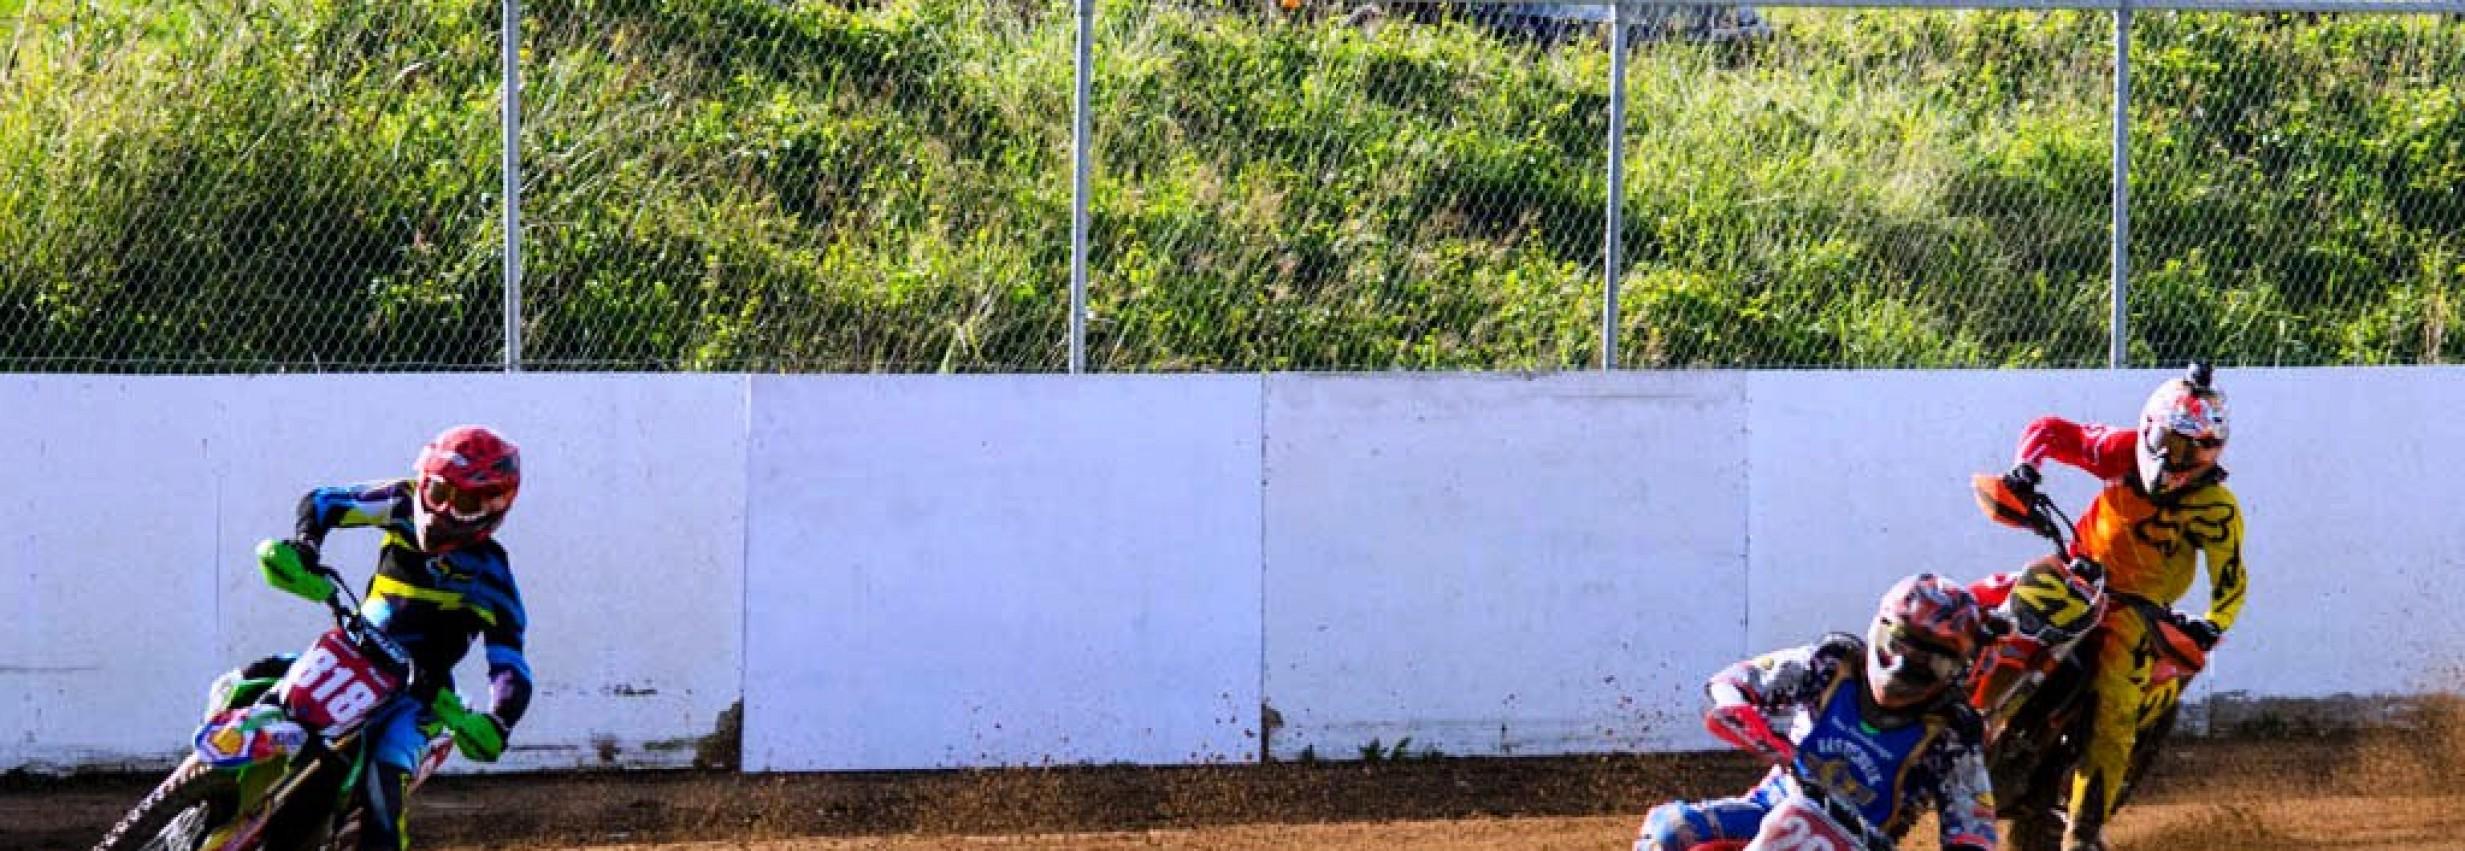 Mick Doohan Raceway